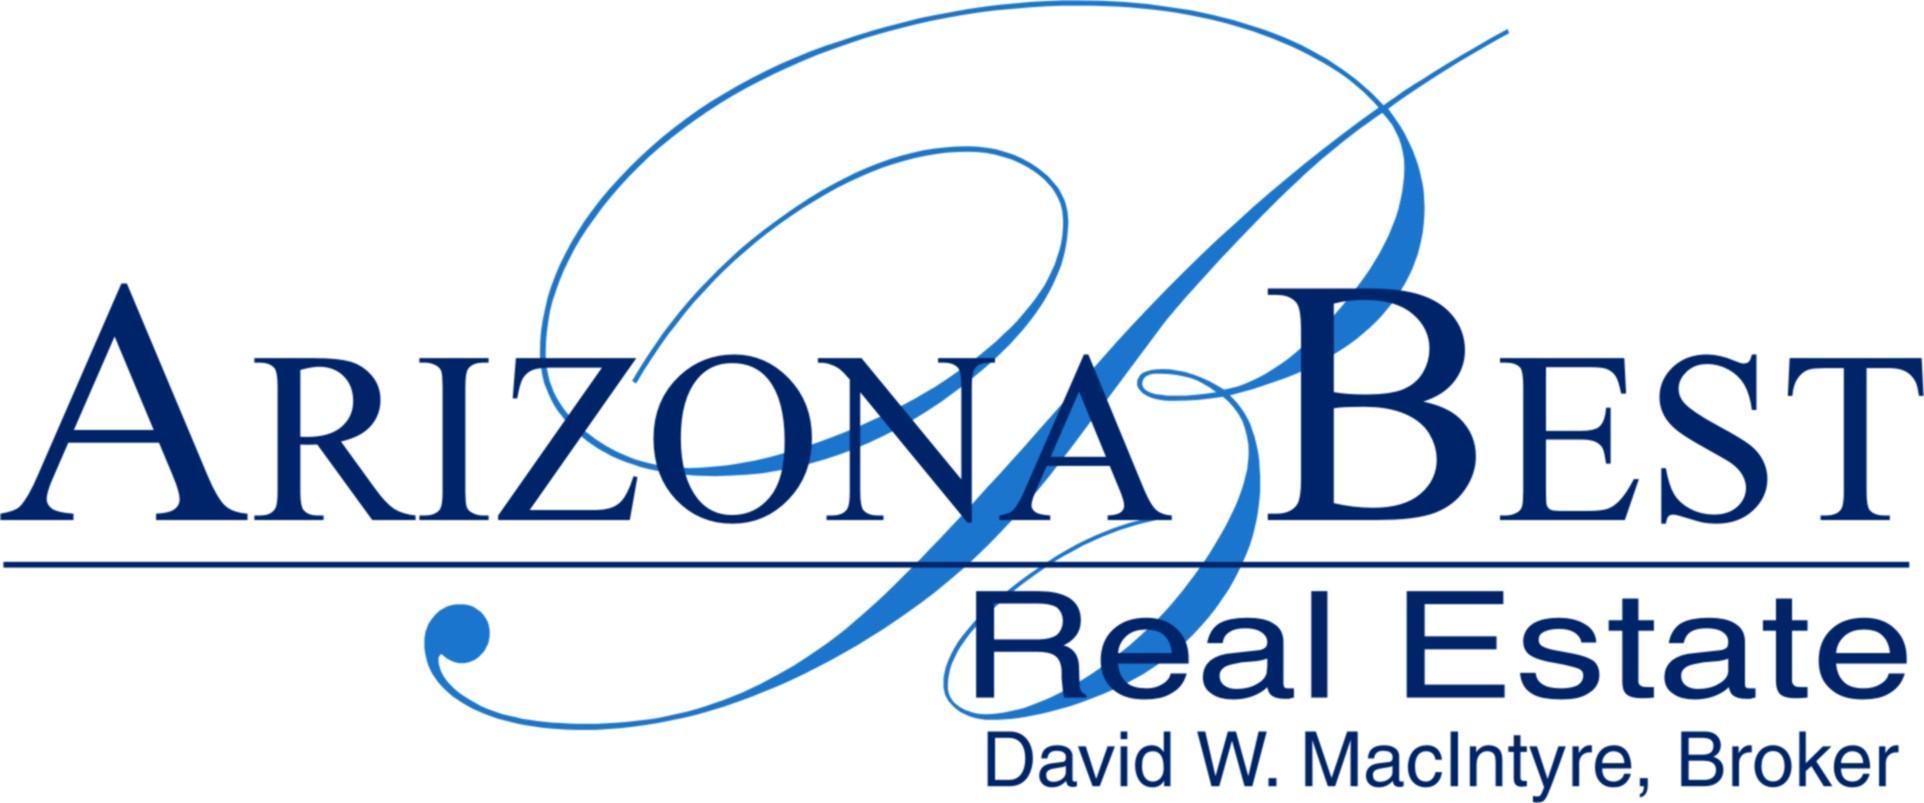 Arizona Best Real Estate Kelly Karbon 480 313 4952 Besthomesinscottsdale 11333 North Scottsdale Road Suite 100 Az 85254